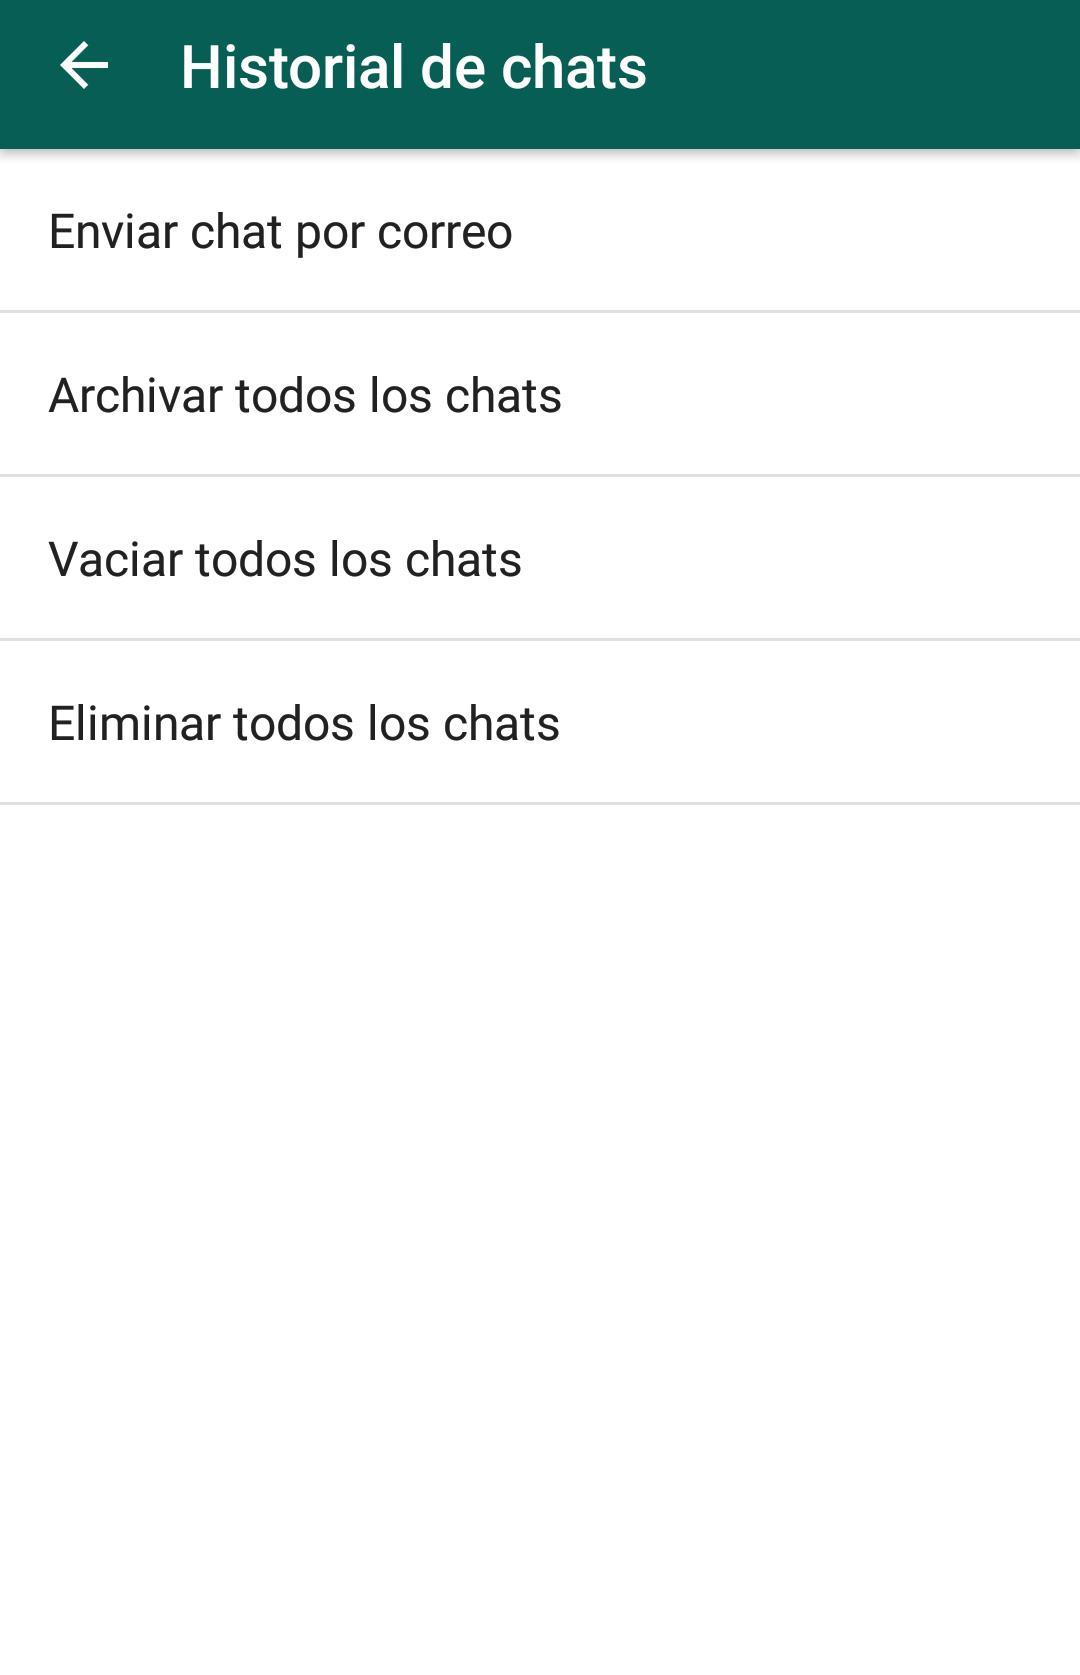 WhatsApp enviar chat por correo